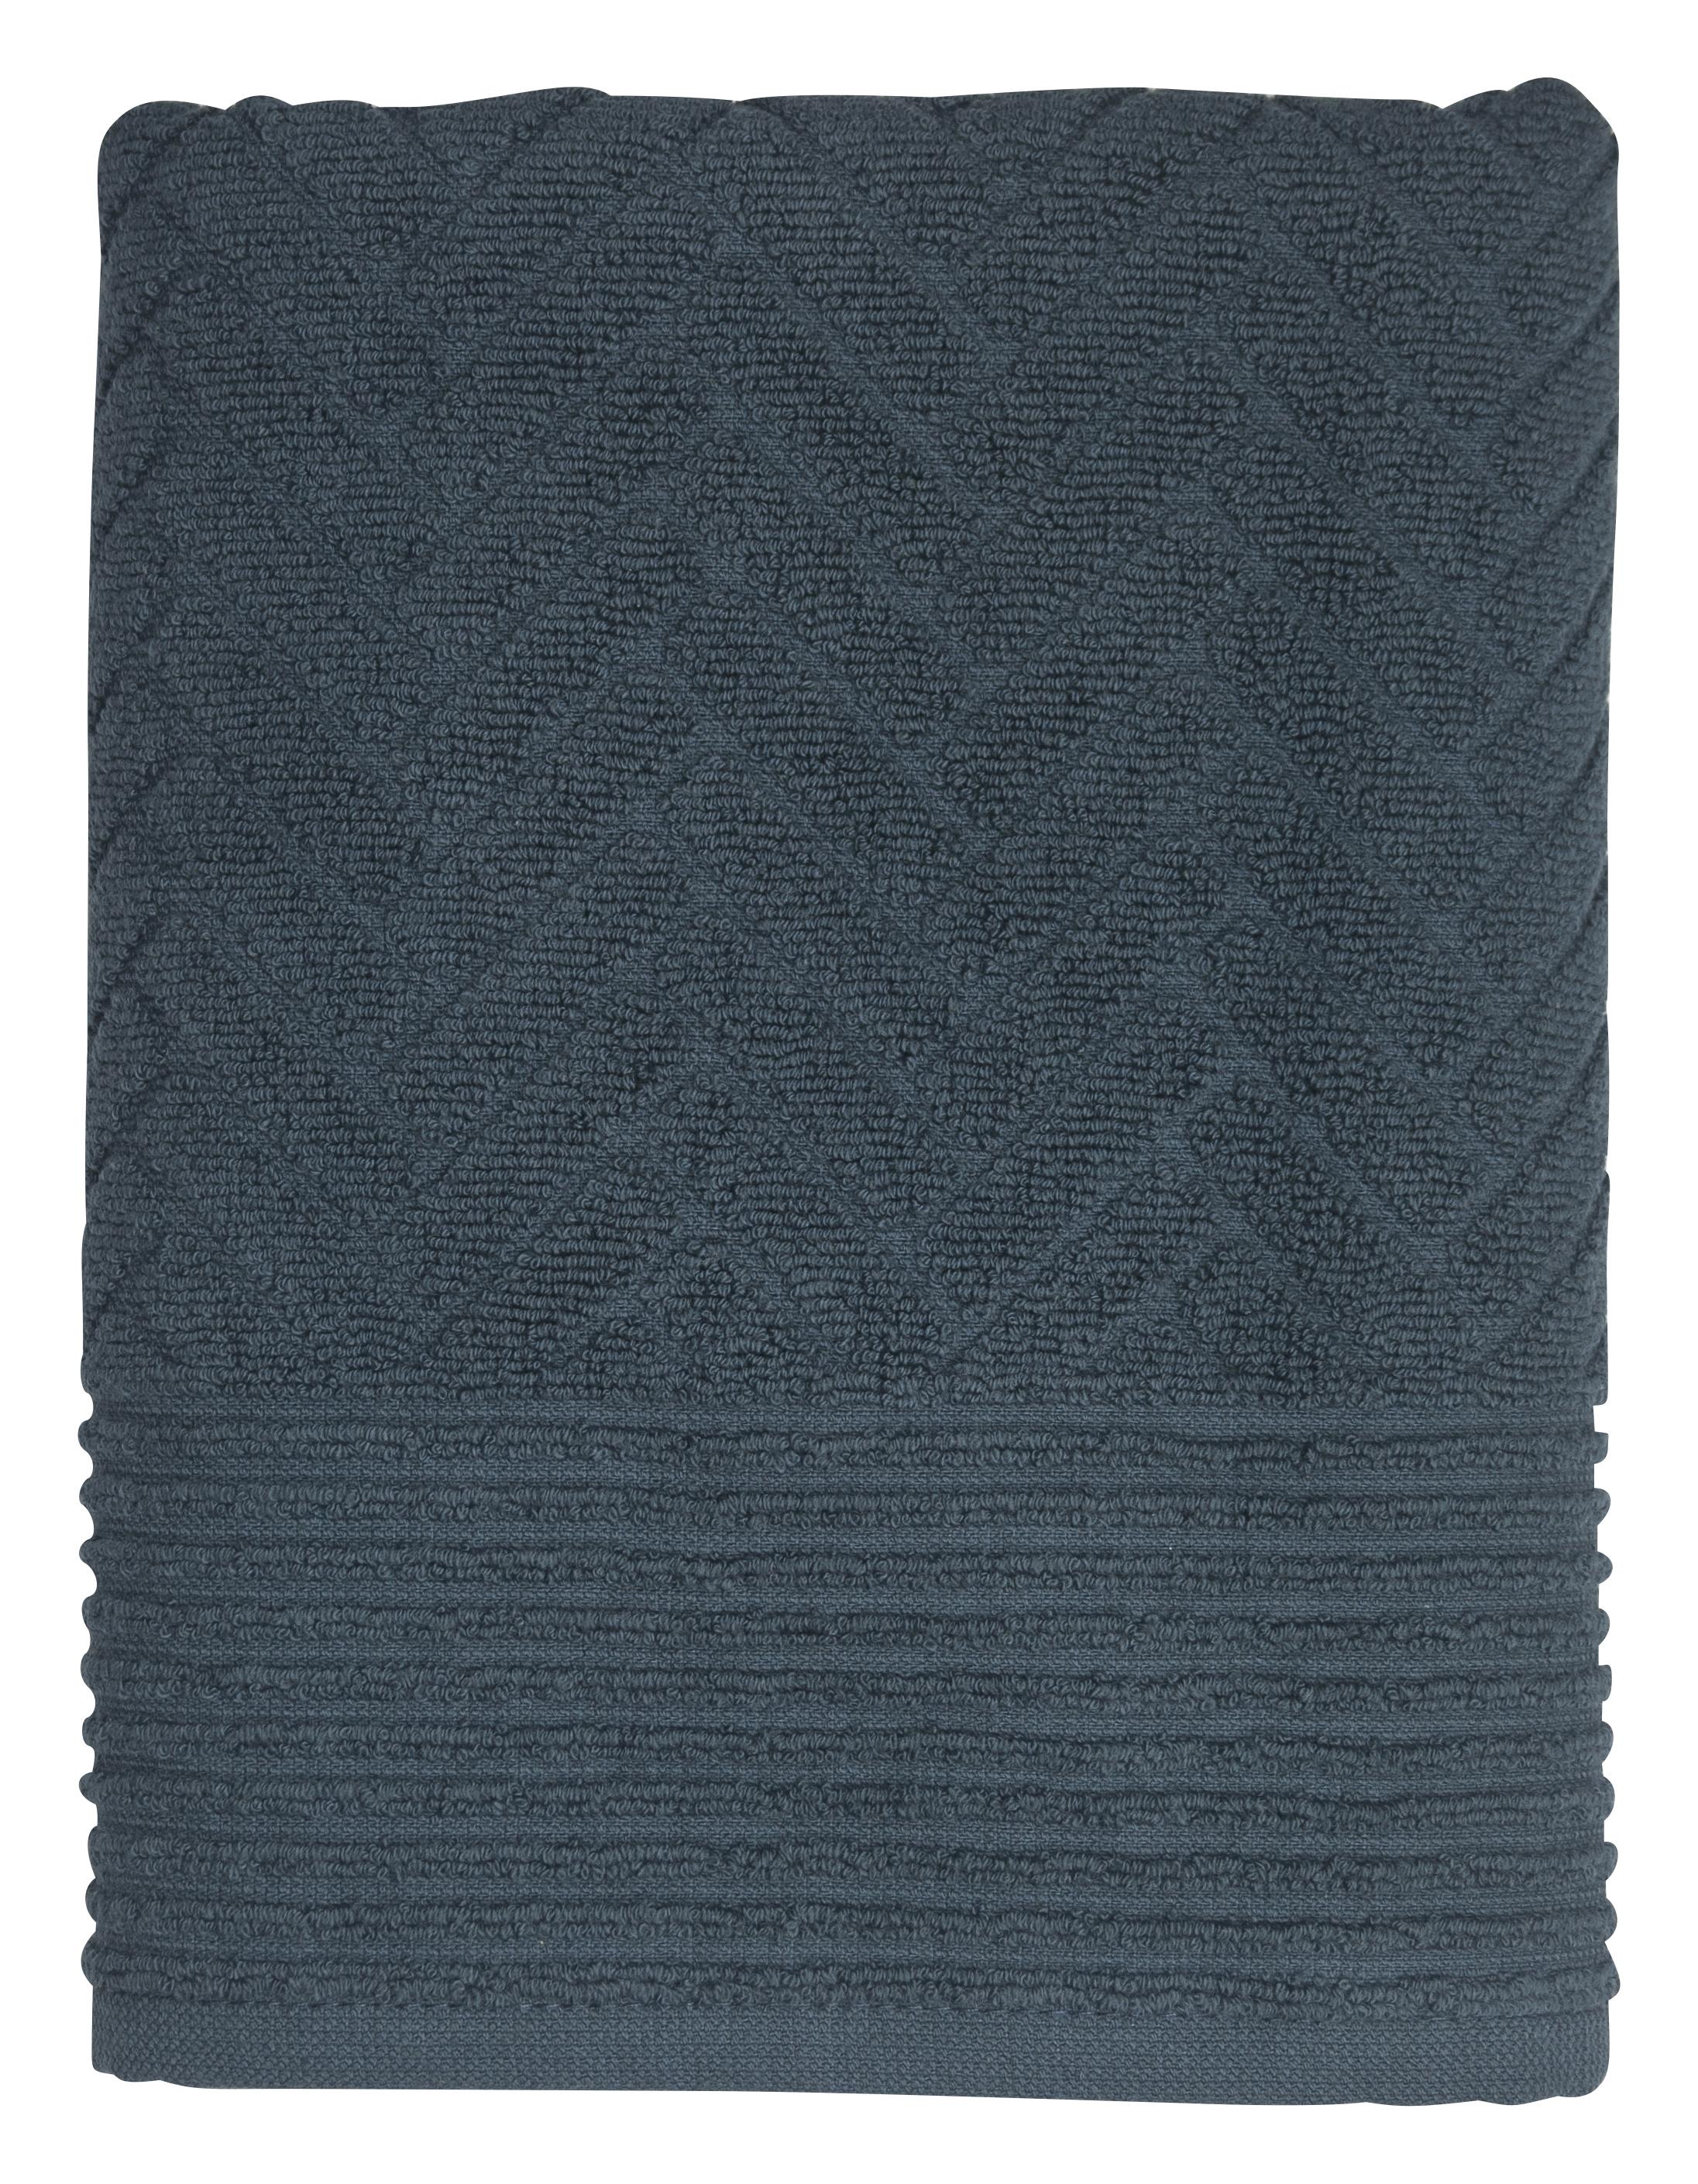 Mette Ditmer Håndklæde, Blå, 35x50 cm